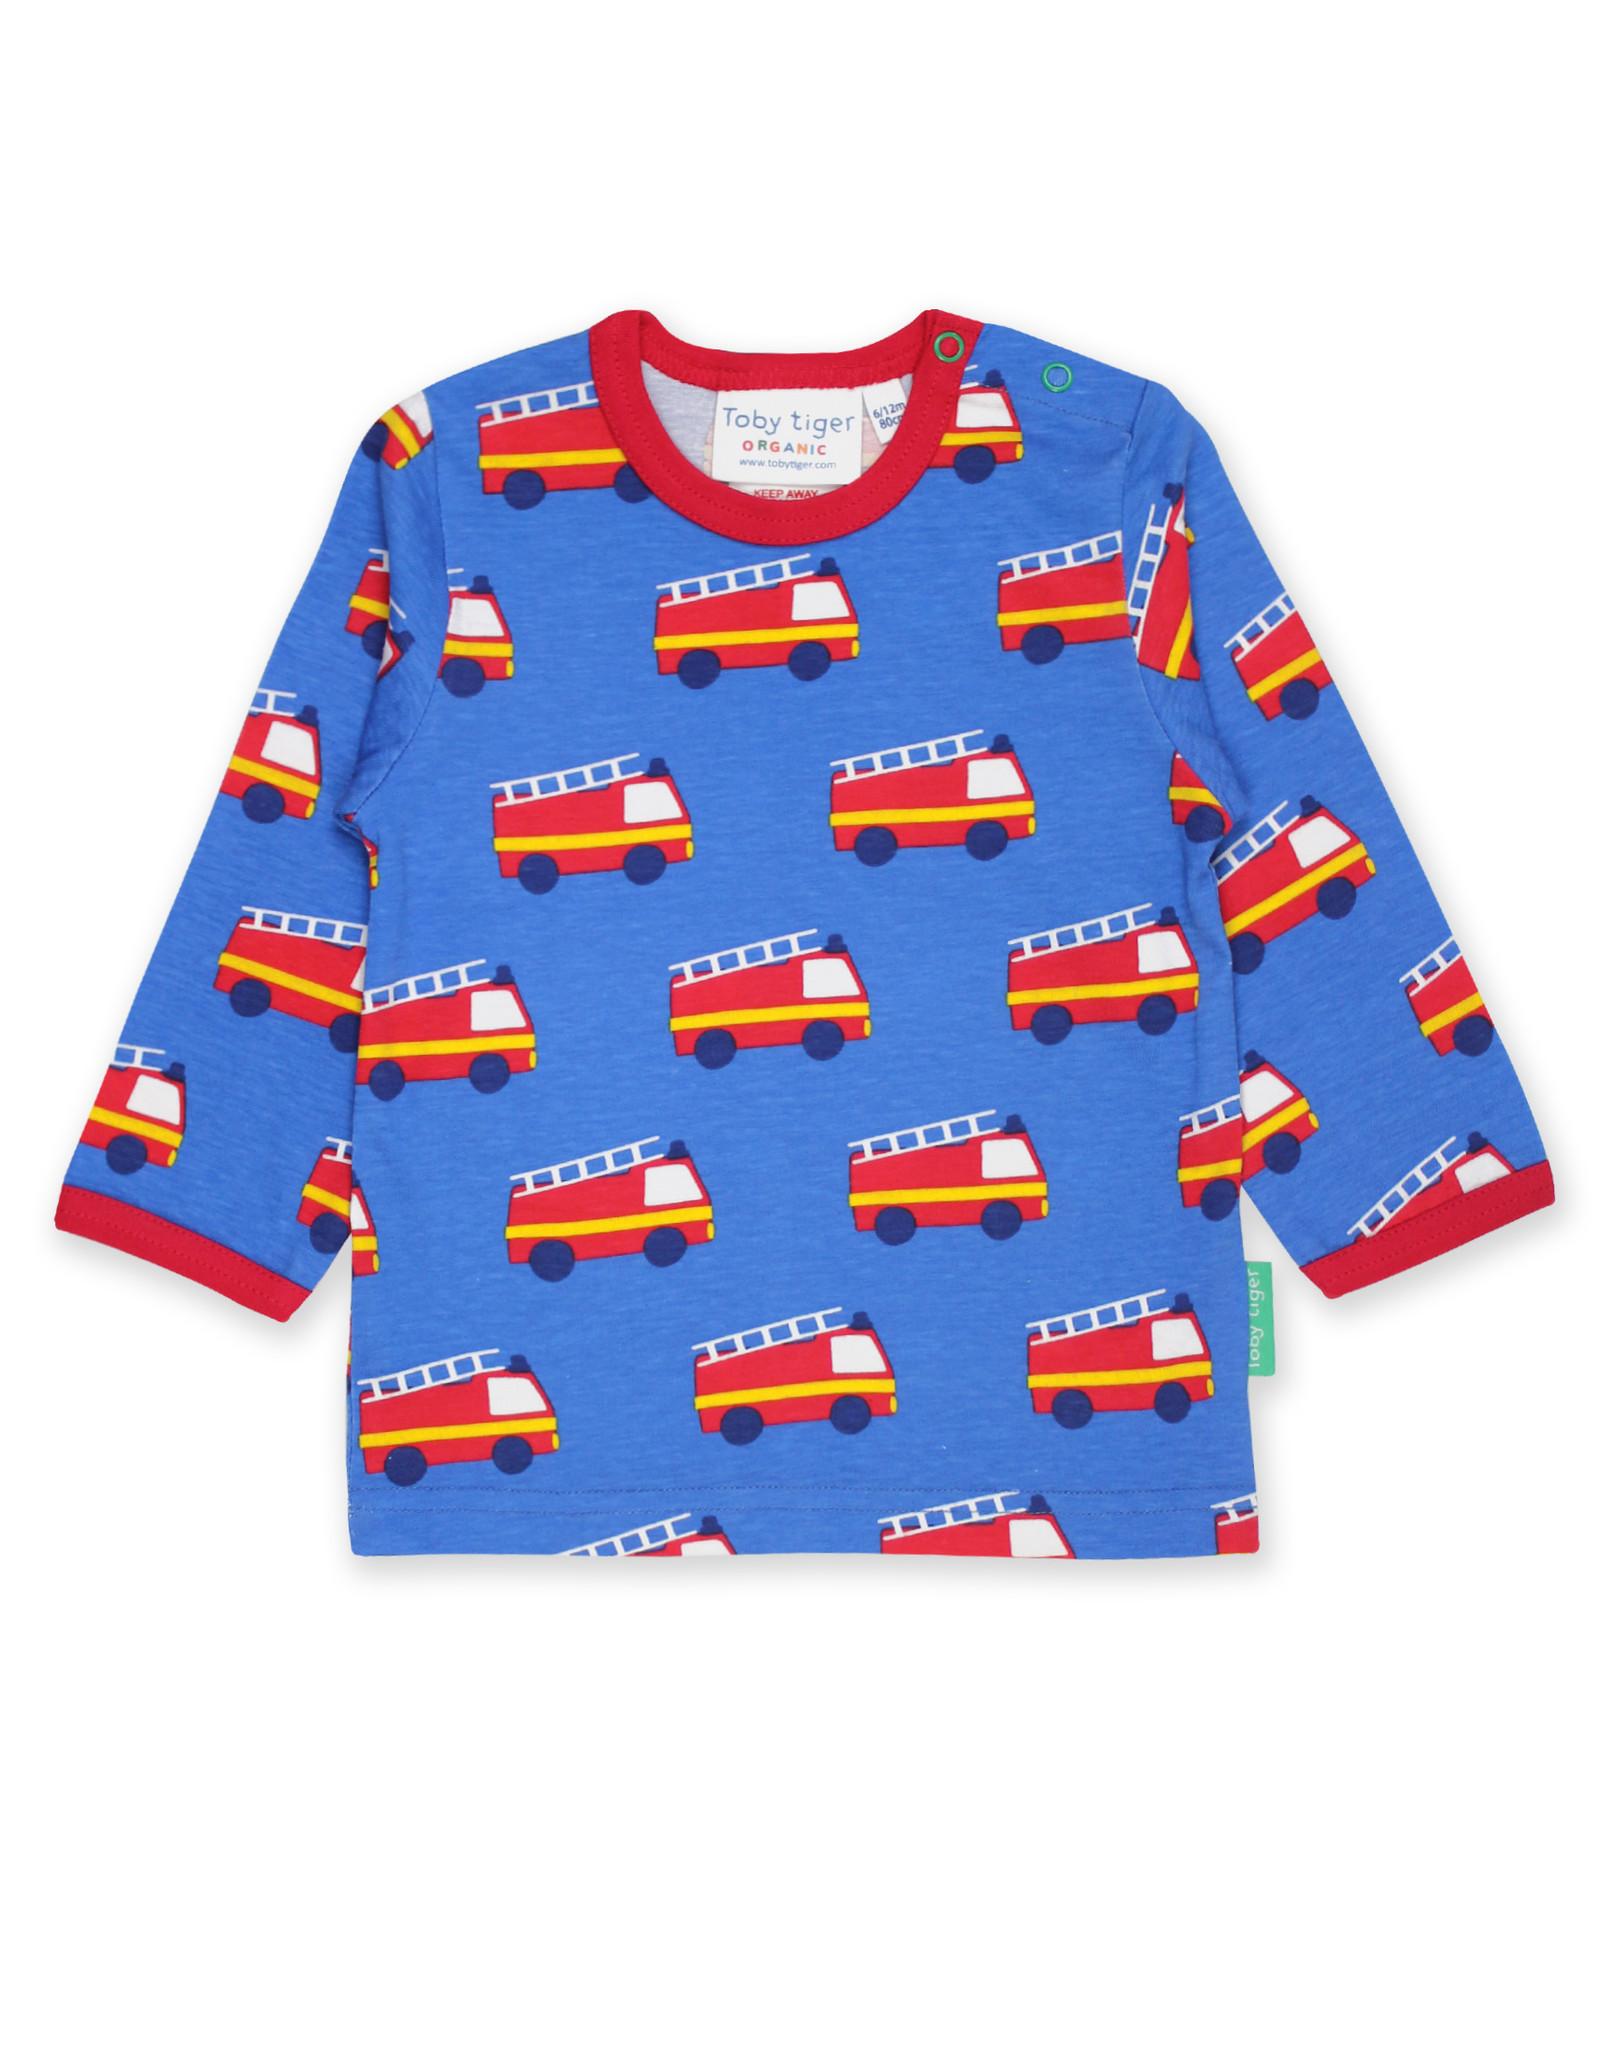 Toby Tiger Kinder shirt - brandweer auto's